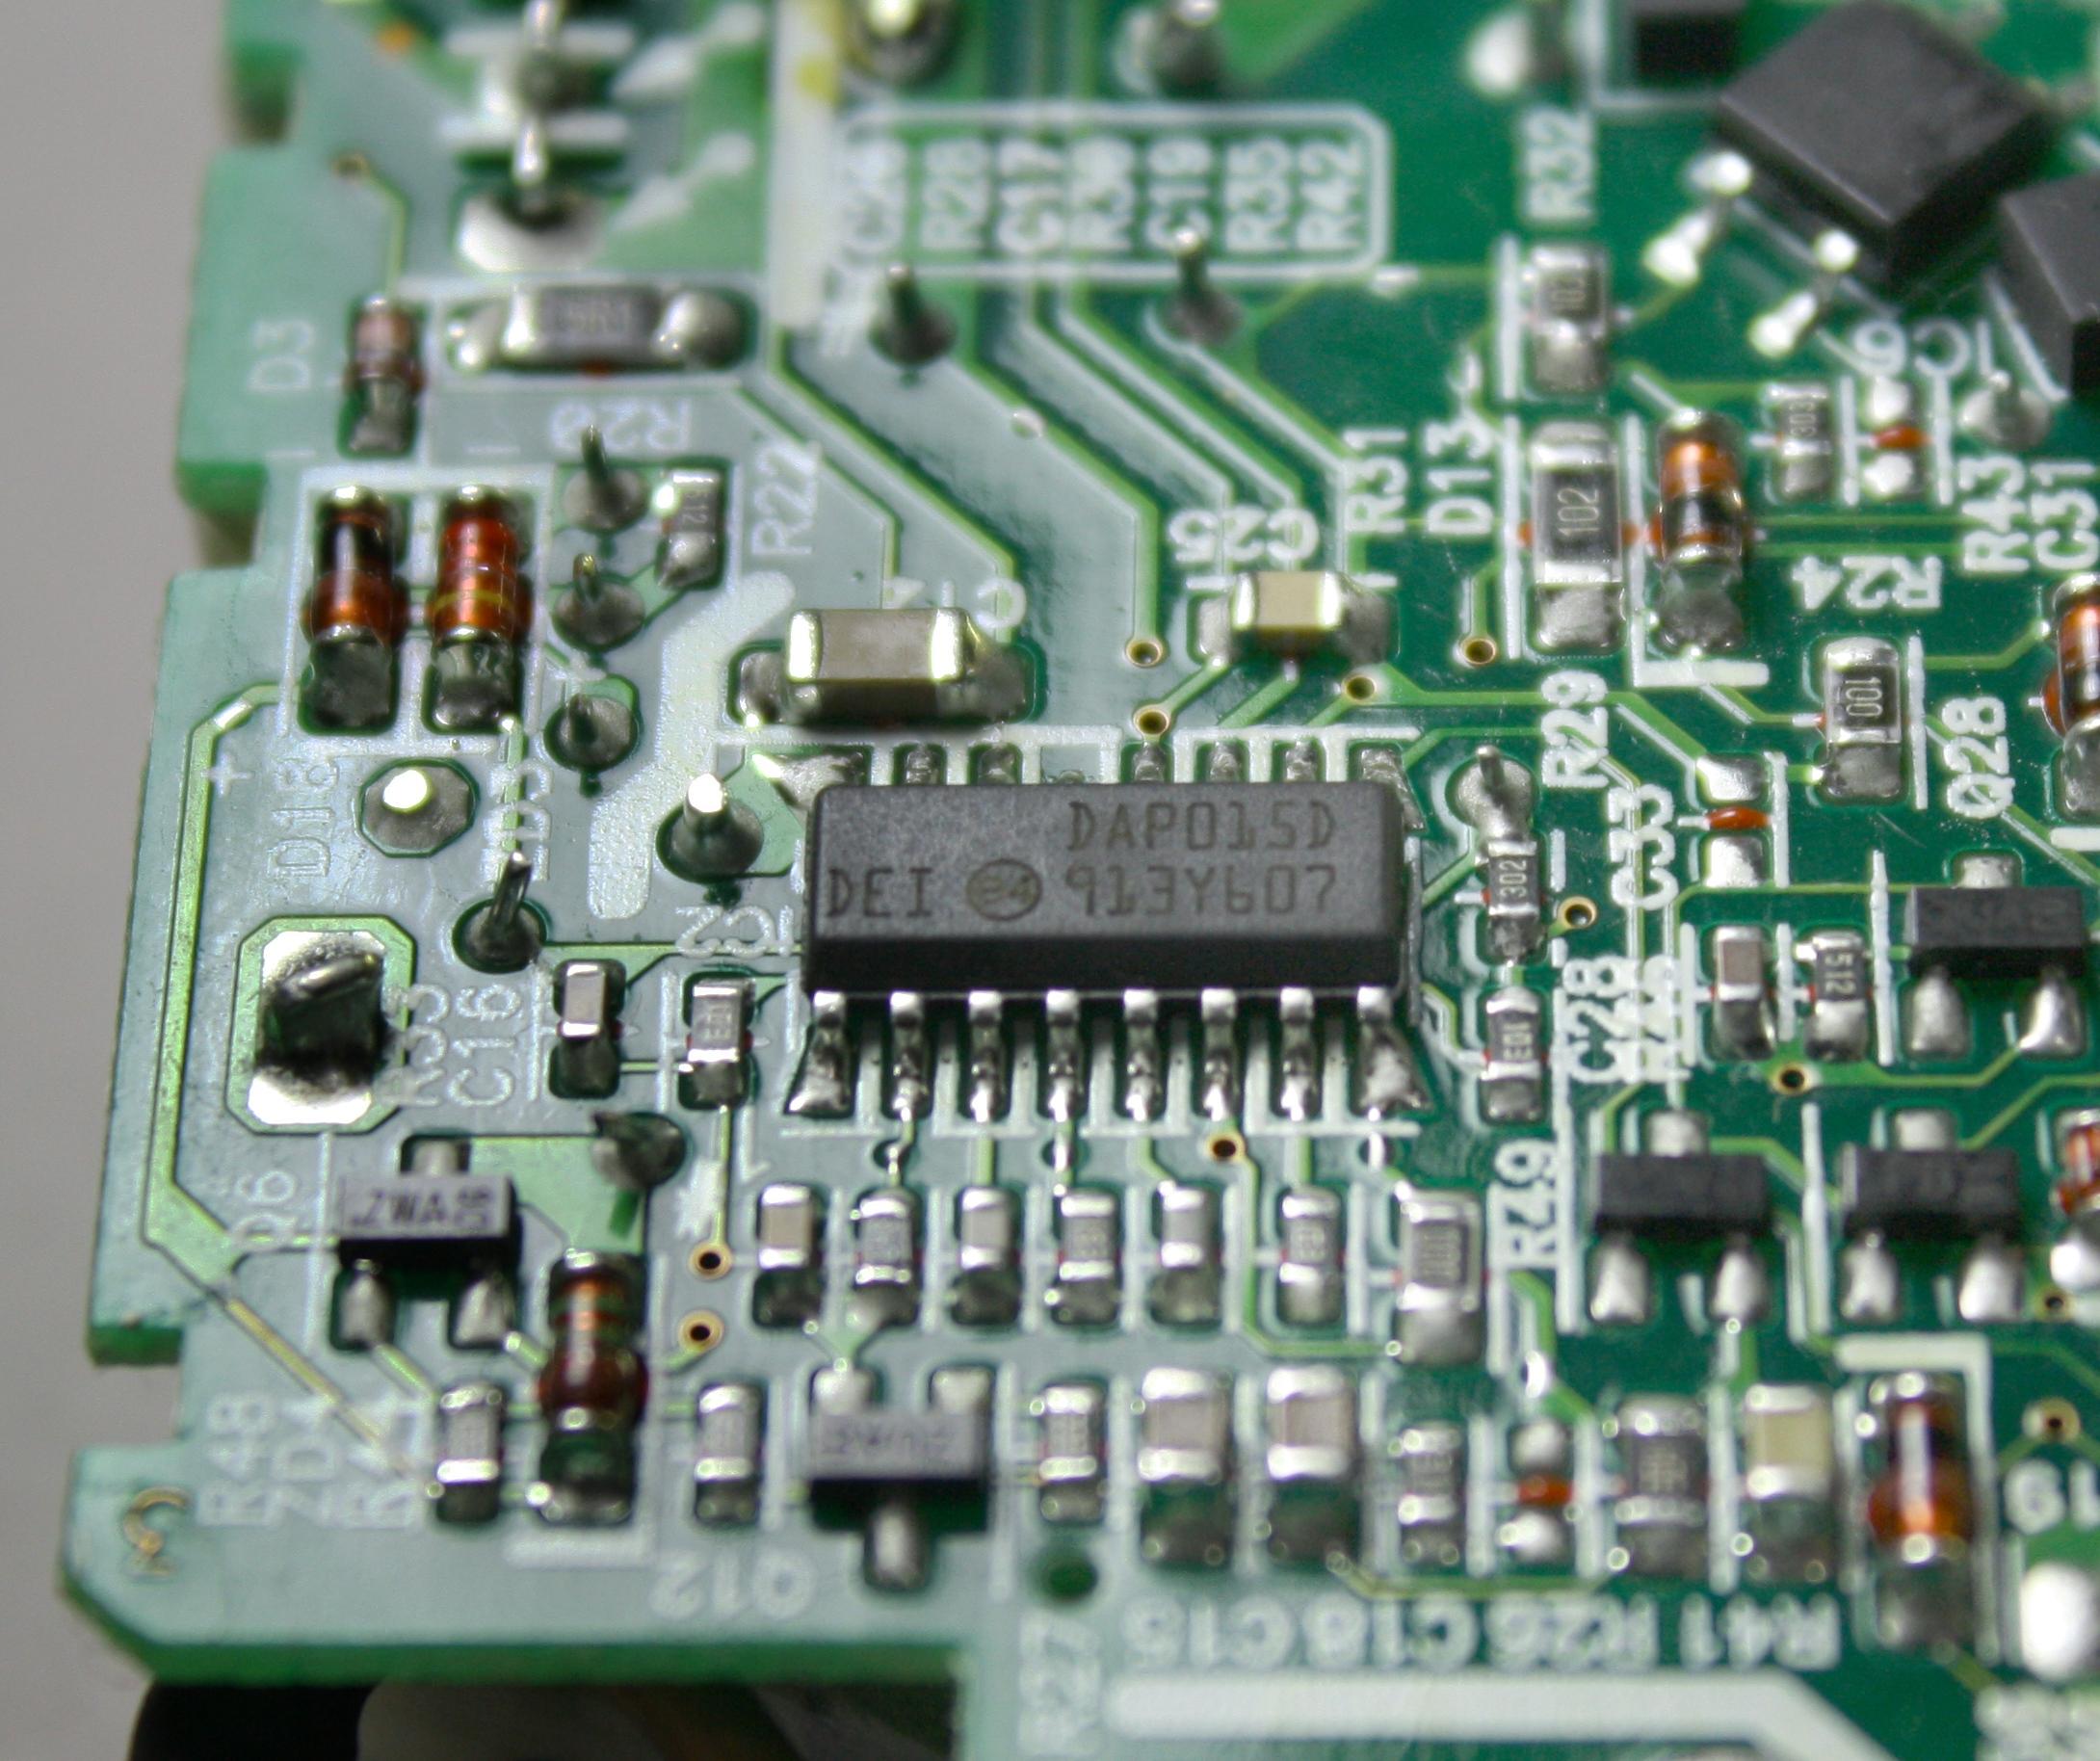 Laptop Motherboard Charging Circuit Diagram  U2013 Wiring Diagram